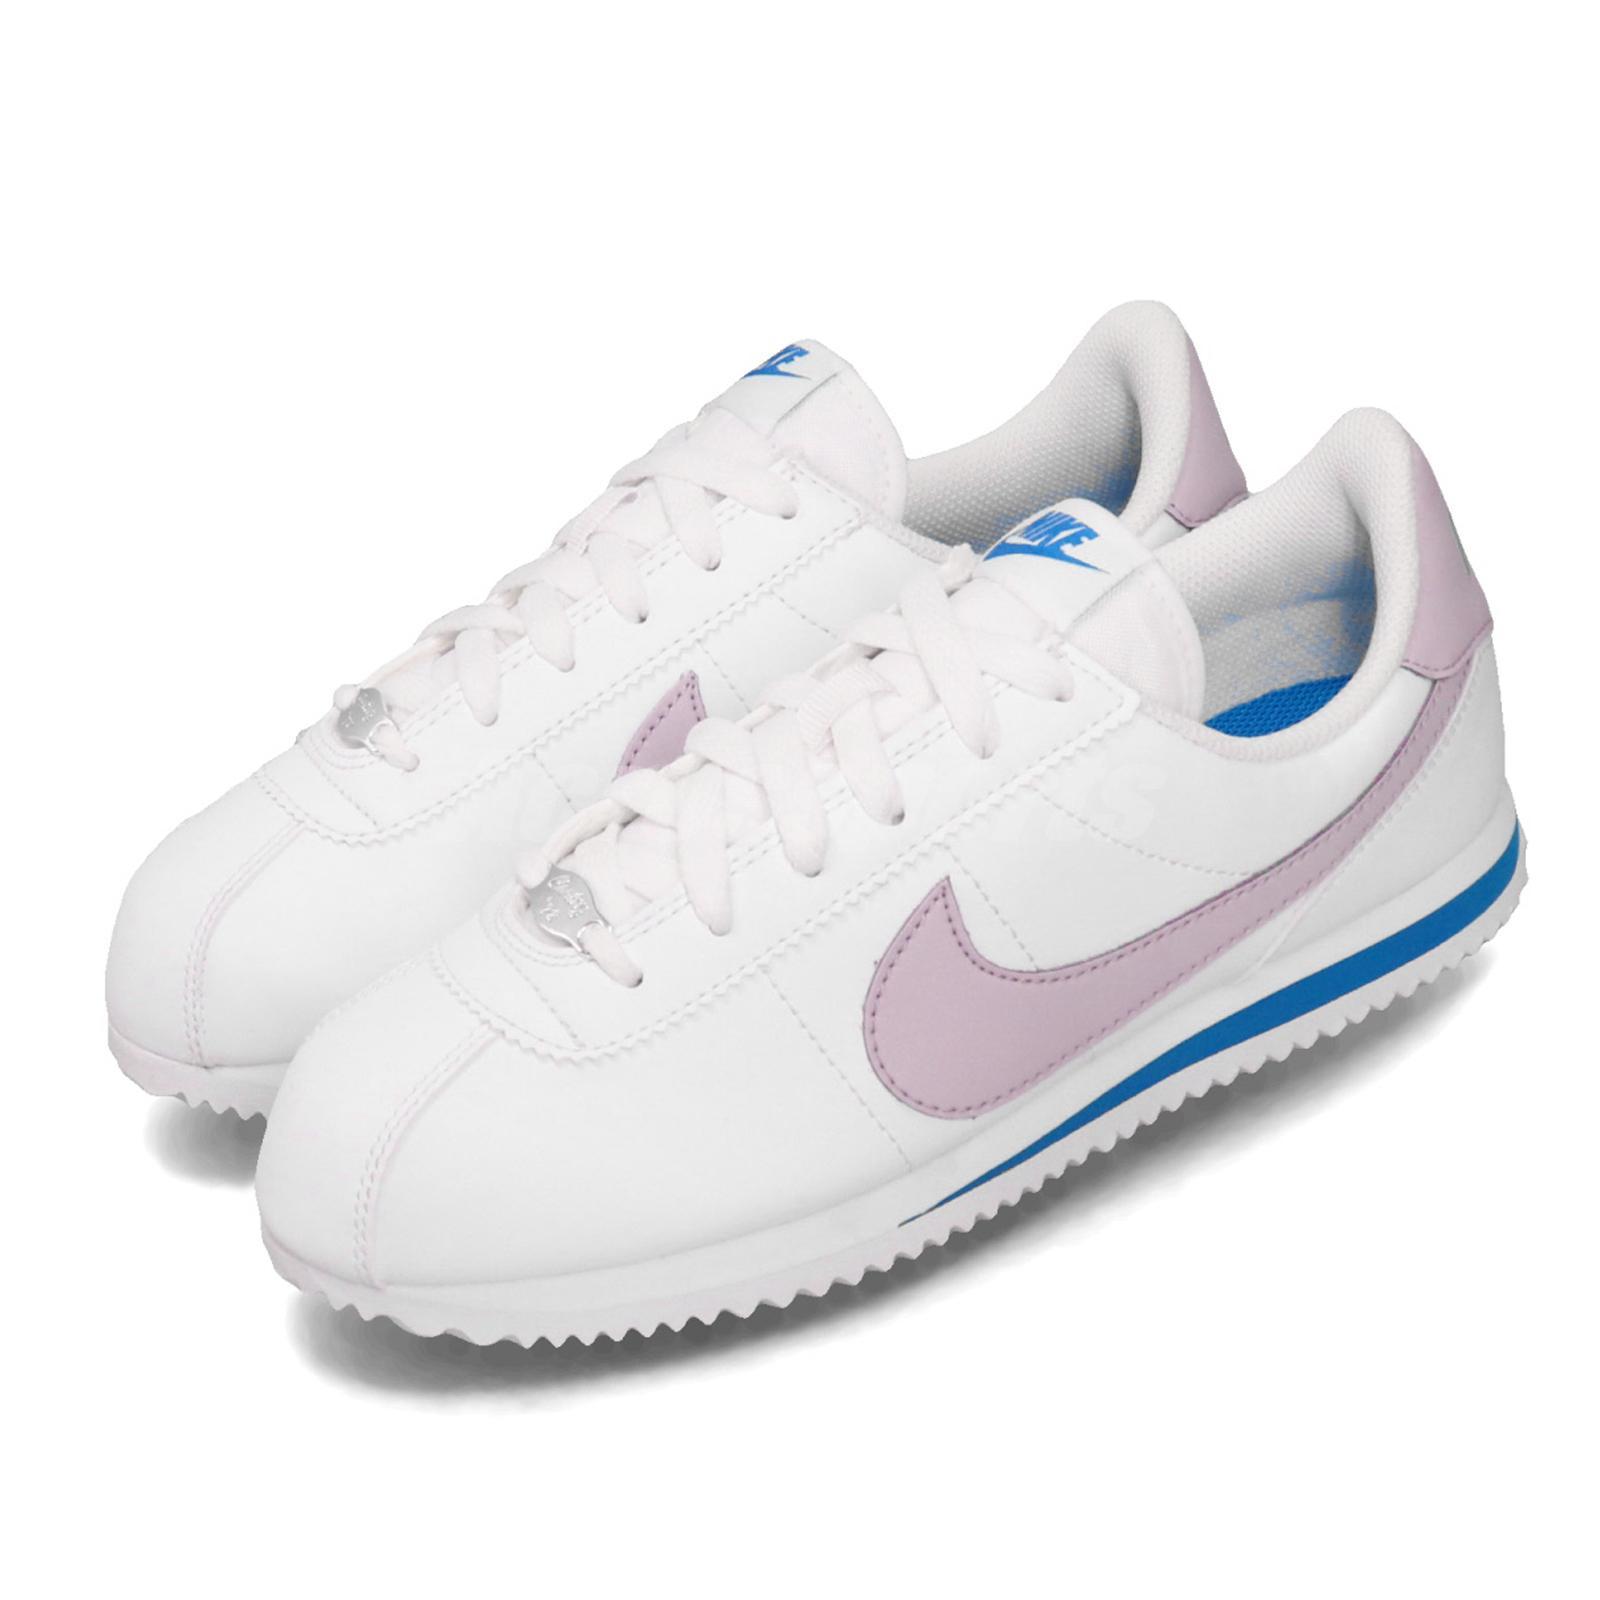 Respetuoso del medio ambiente Microprocesador Alentar  Nike Cortez Basic SL GS White Iced Lilac Purple Blue Kid Women Shoes  904764-108 | eBay